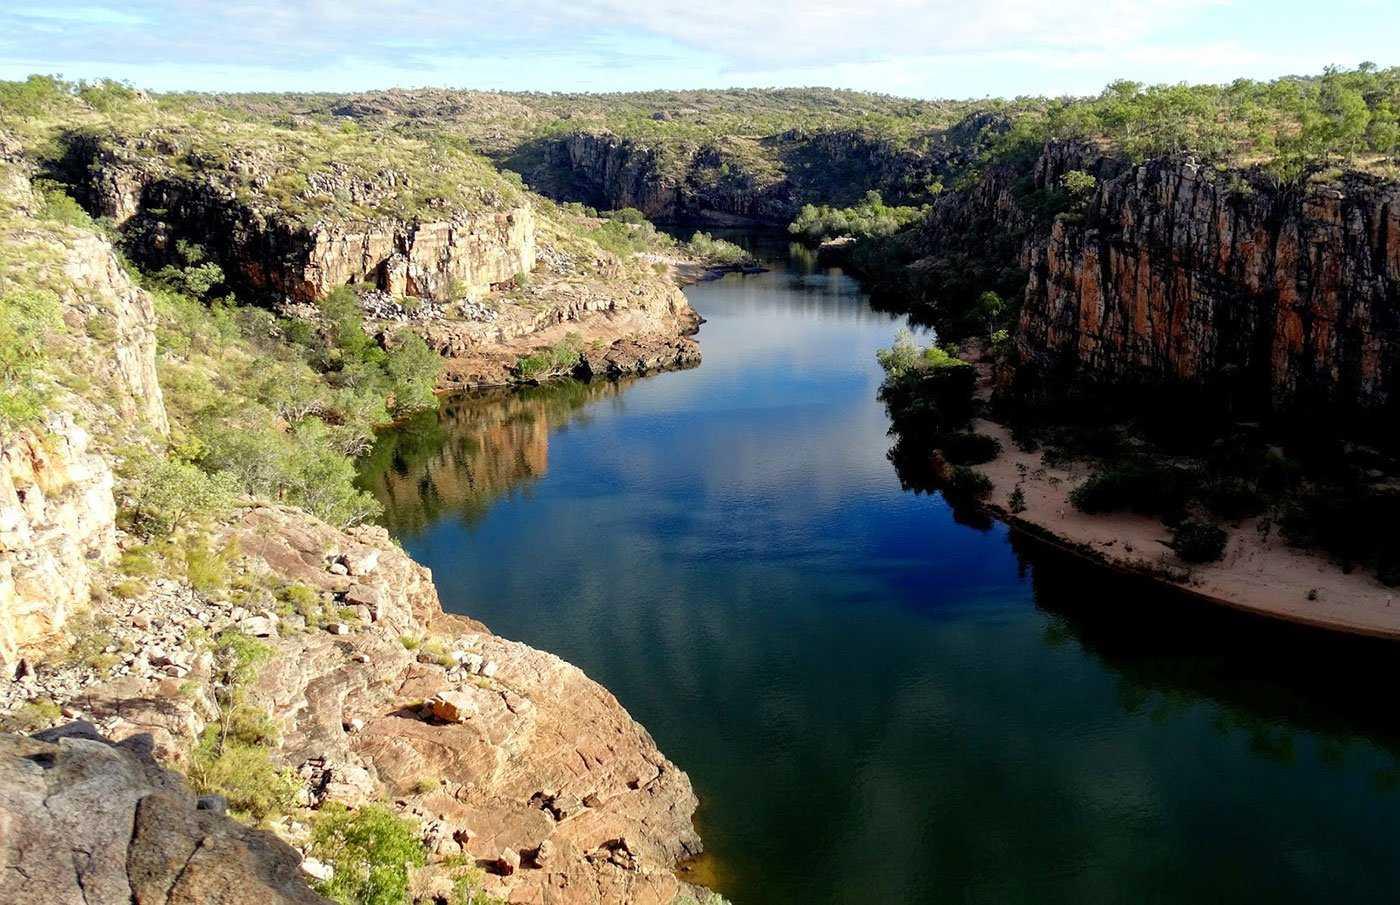 The Nitmiluk Gorge Travel The World Without Leaving Australia